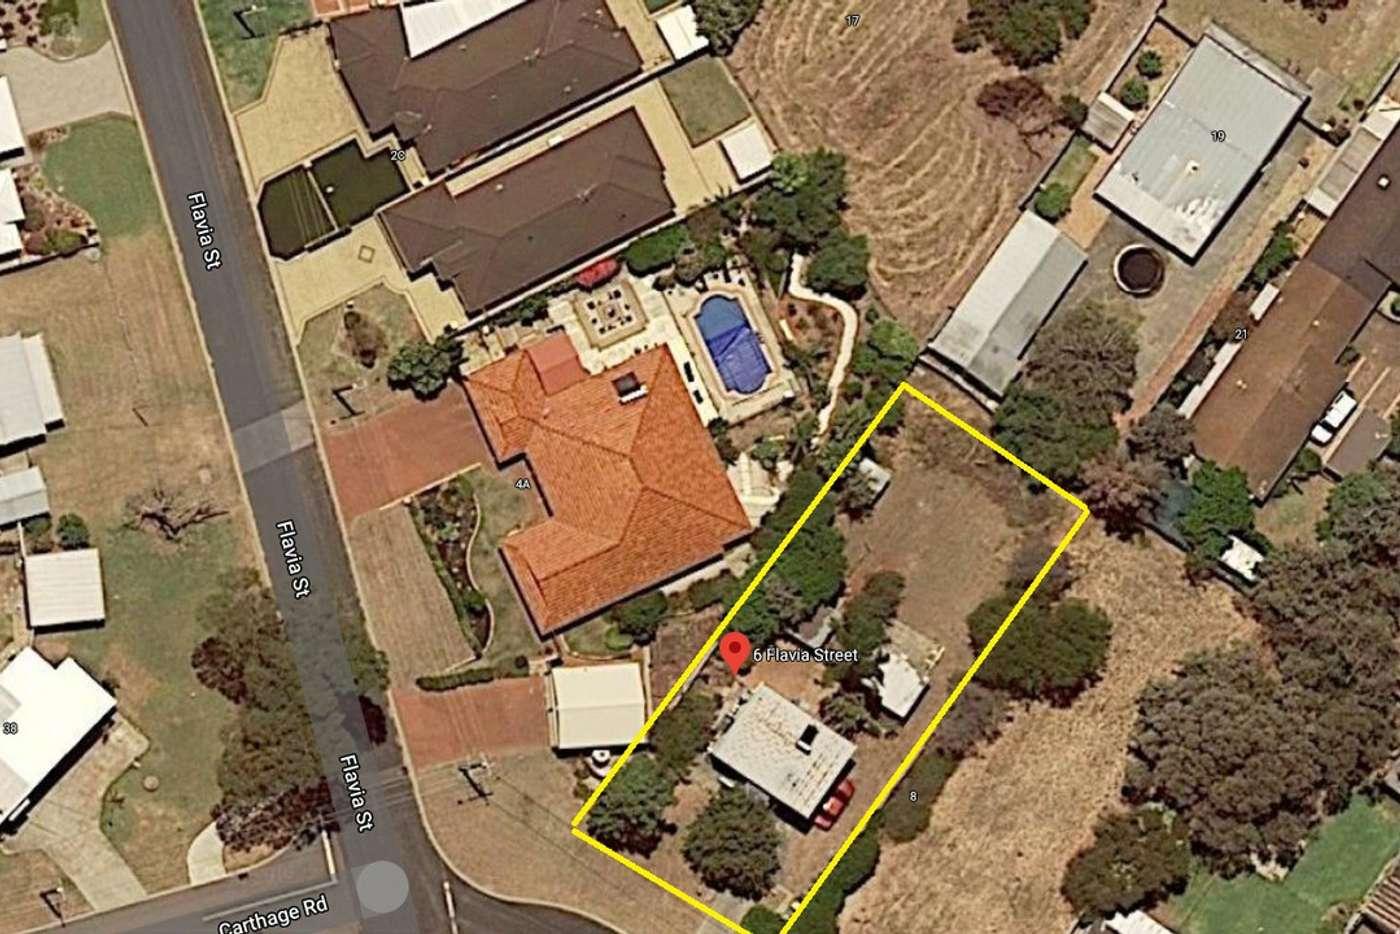 Main view of Homely house listing, 6 Flavia Street, Falcon WA 6210